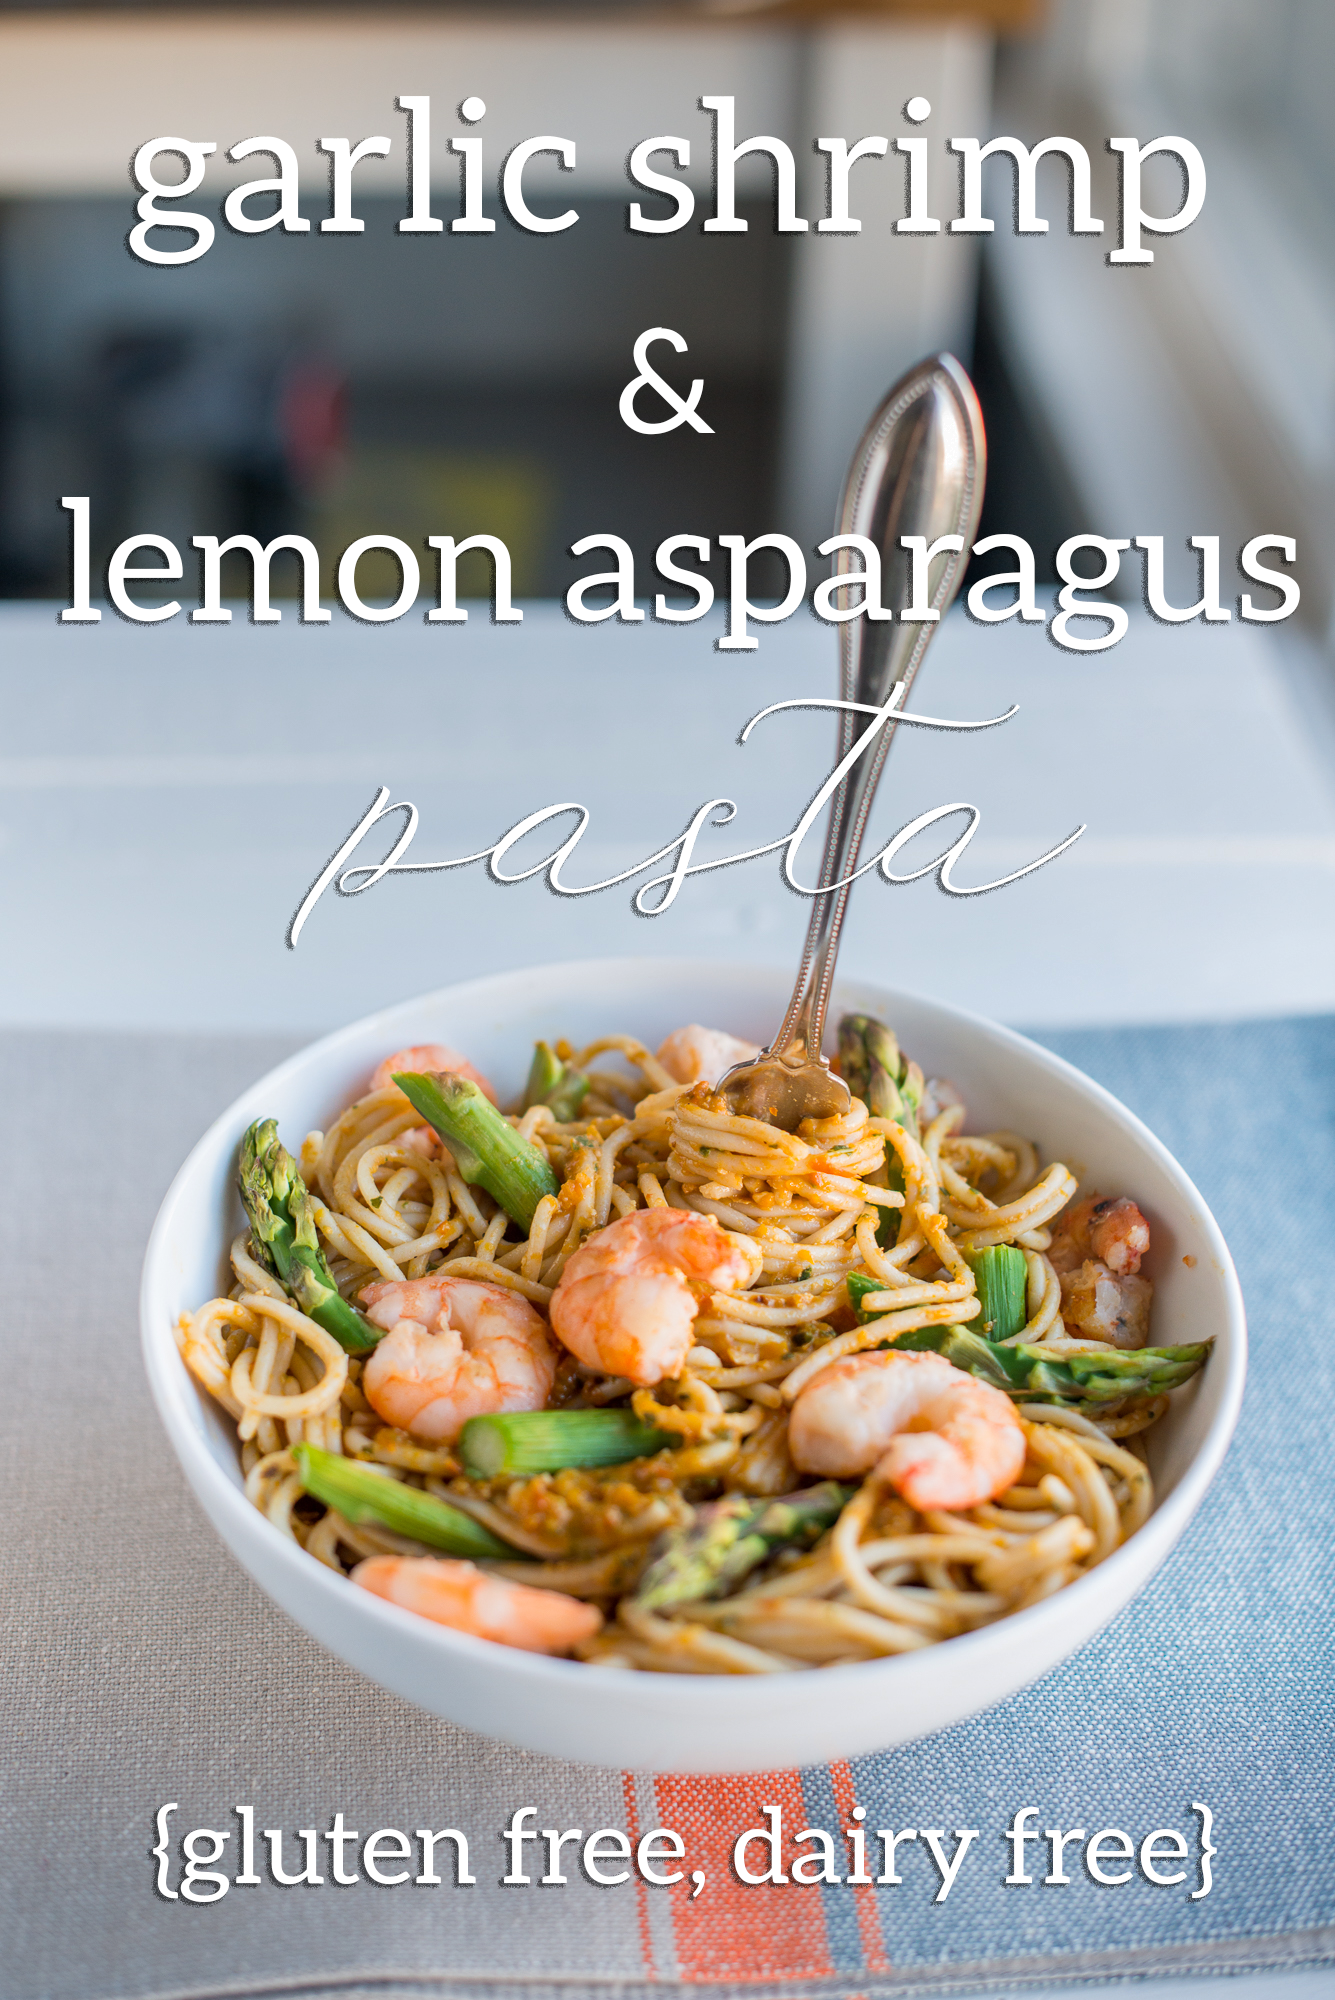 Garlic Shrimp & Lemon Asparagus Pasta (Gluten Free, Dairy Free)